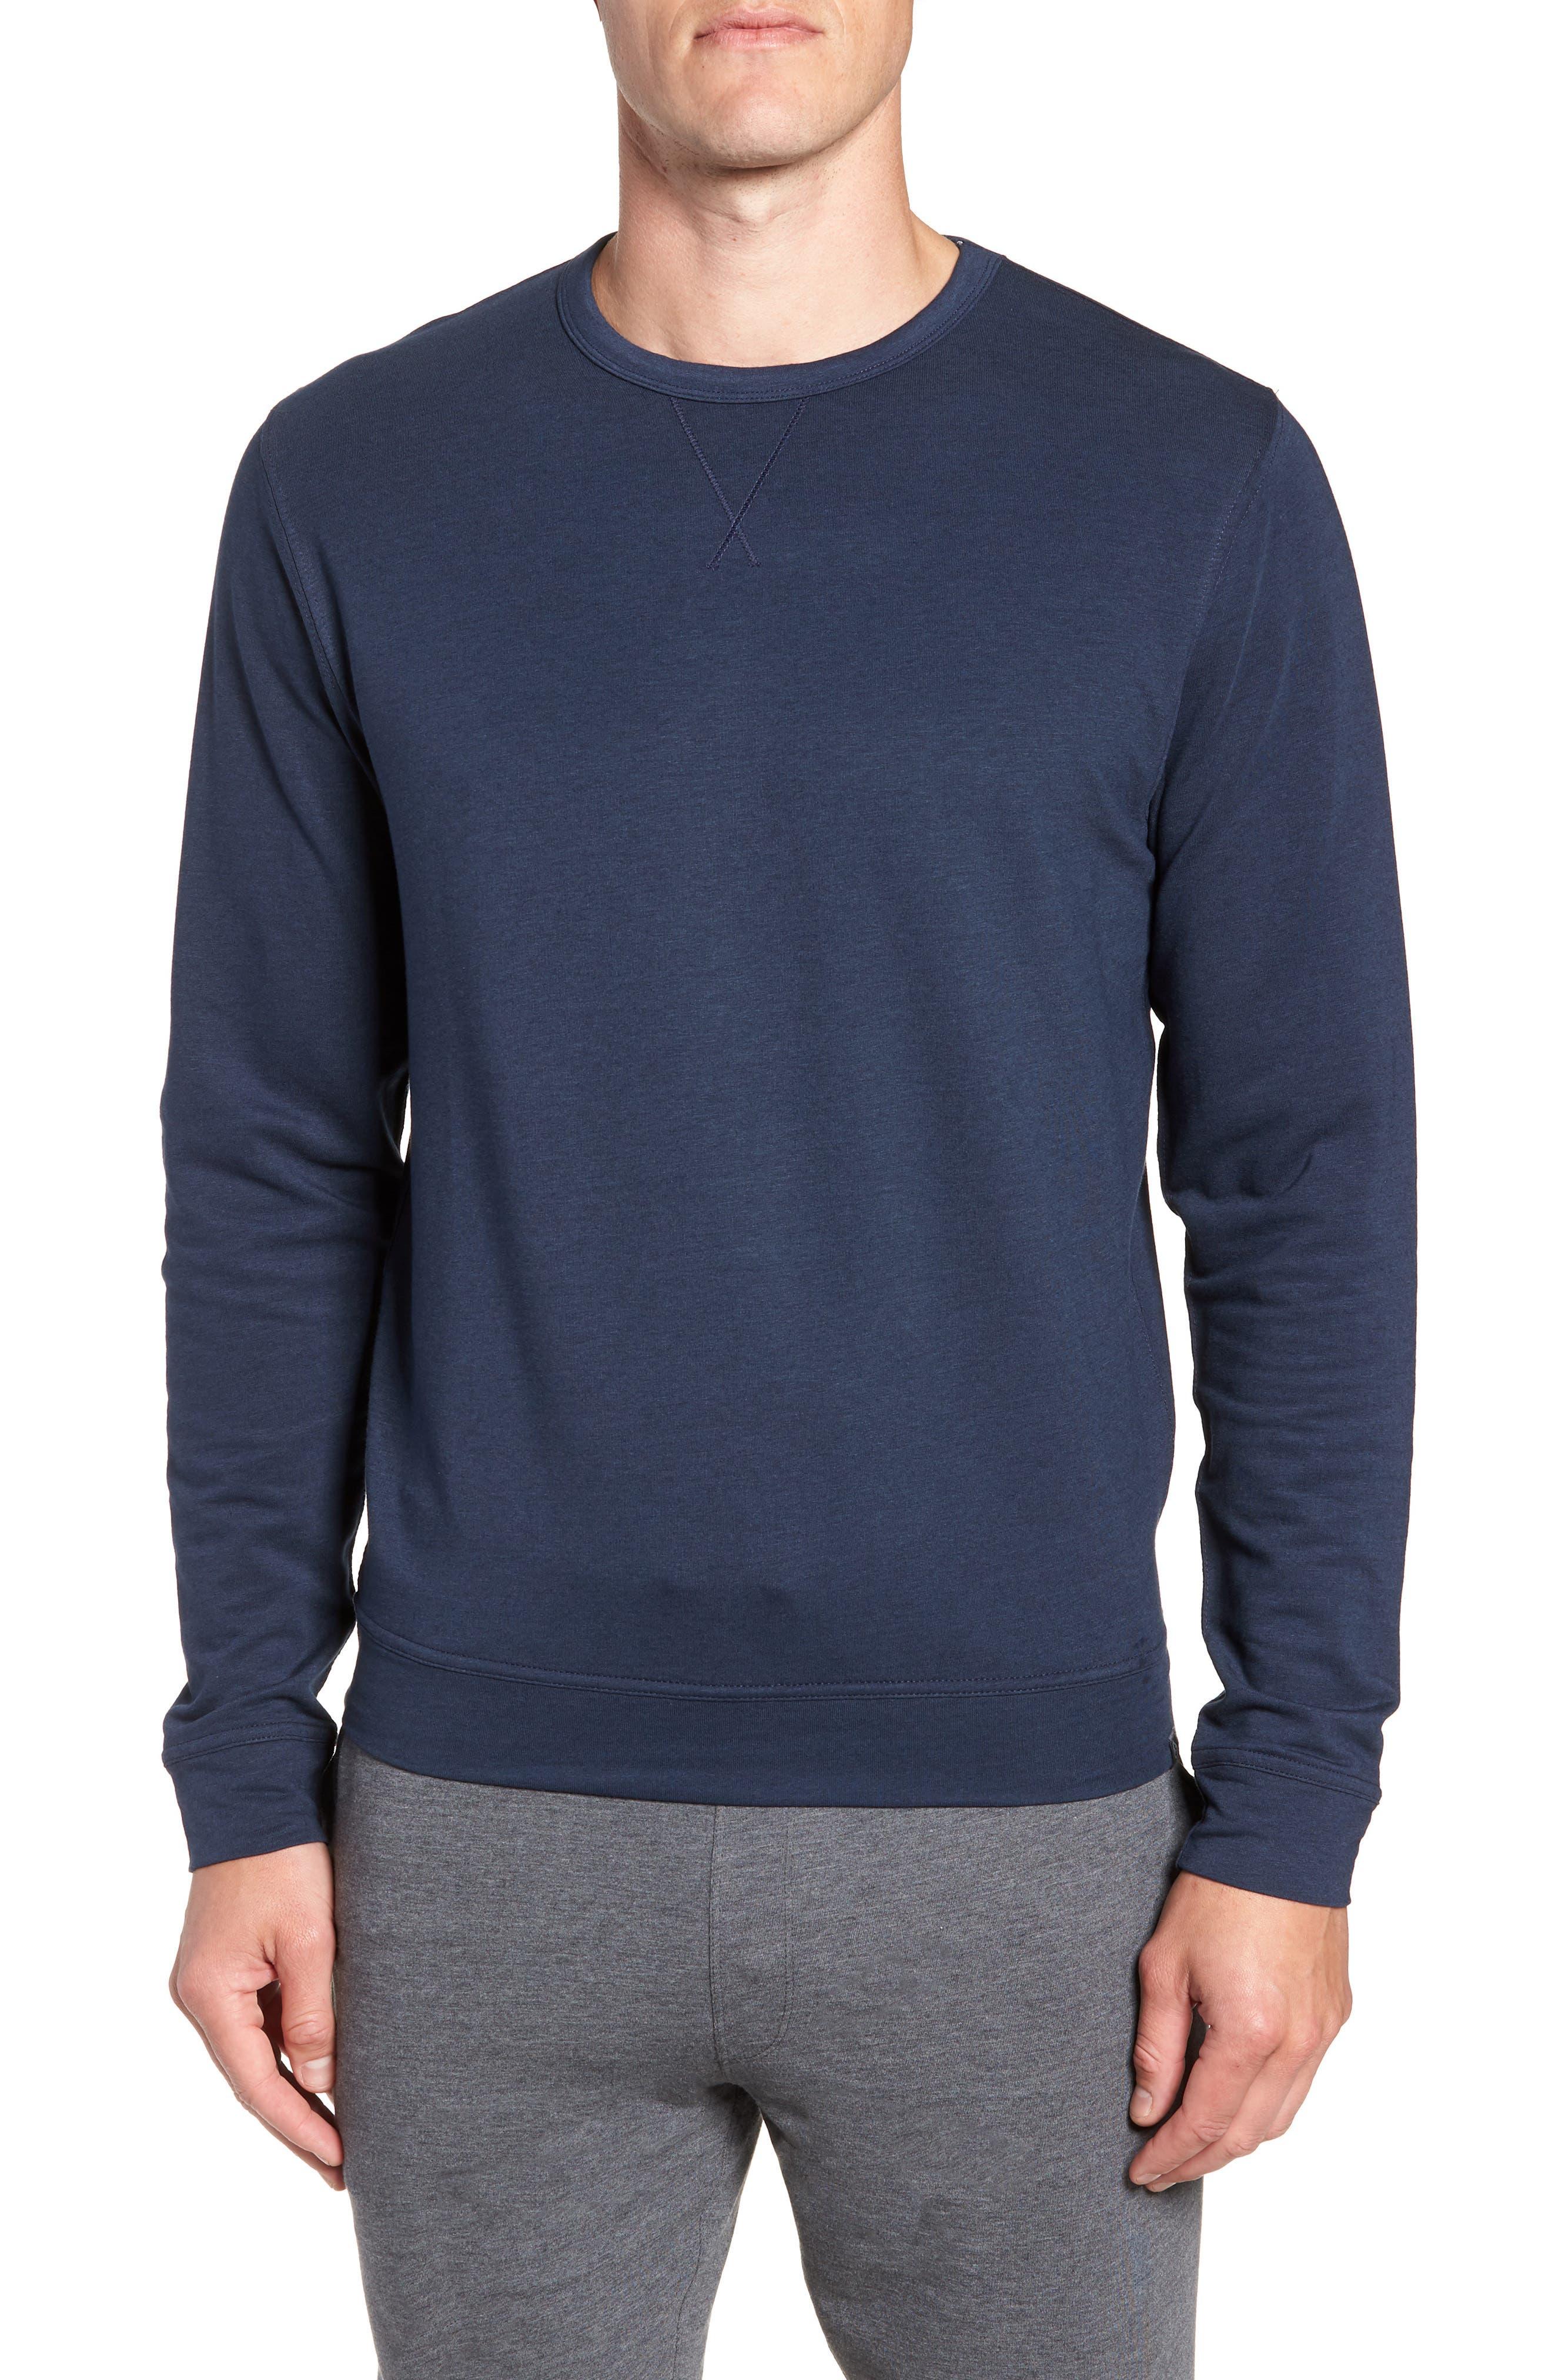 TASC PERFORMANCE, Legacy Crewneck Semi Fitted Sweatshirt, Main thumbnail 1, color, CLASSIC NAVY